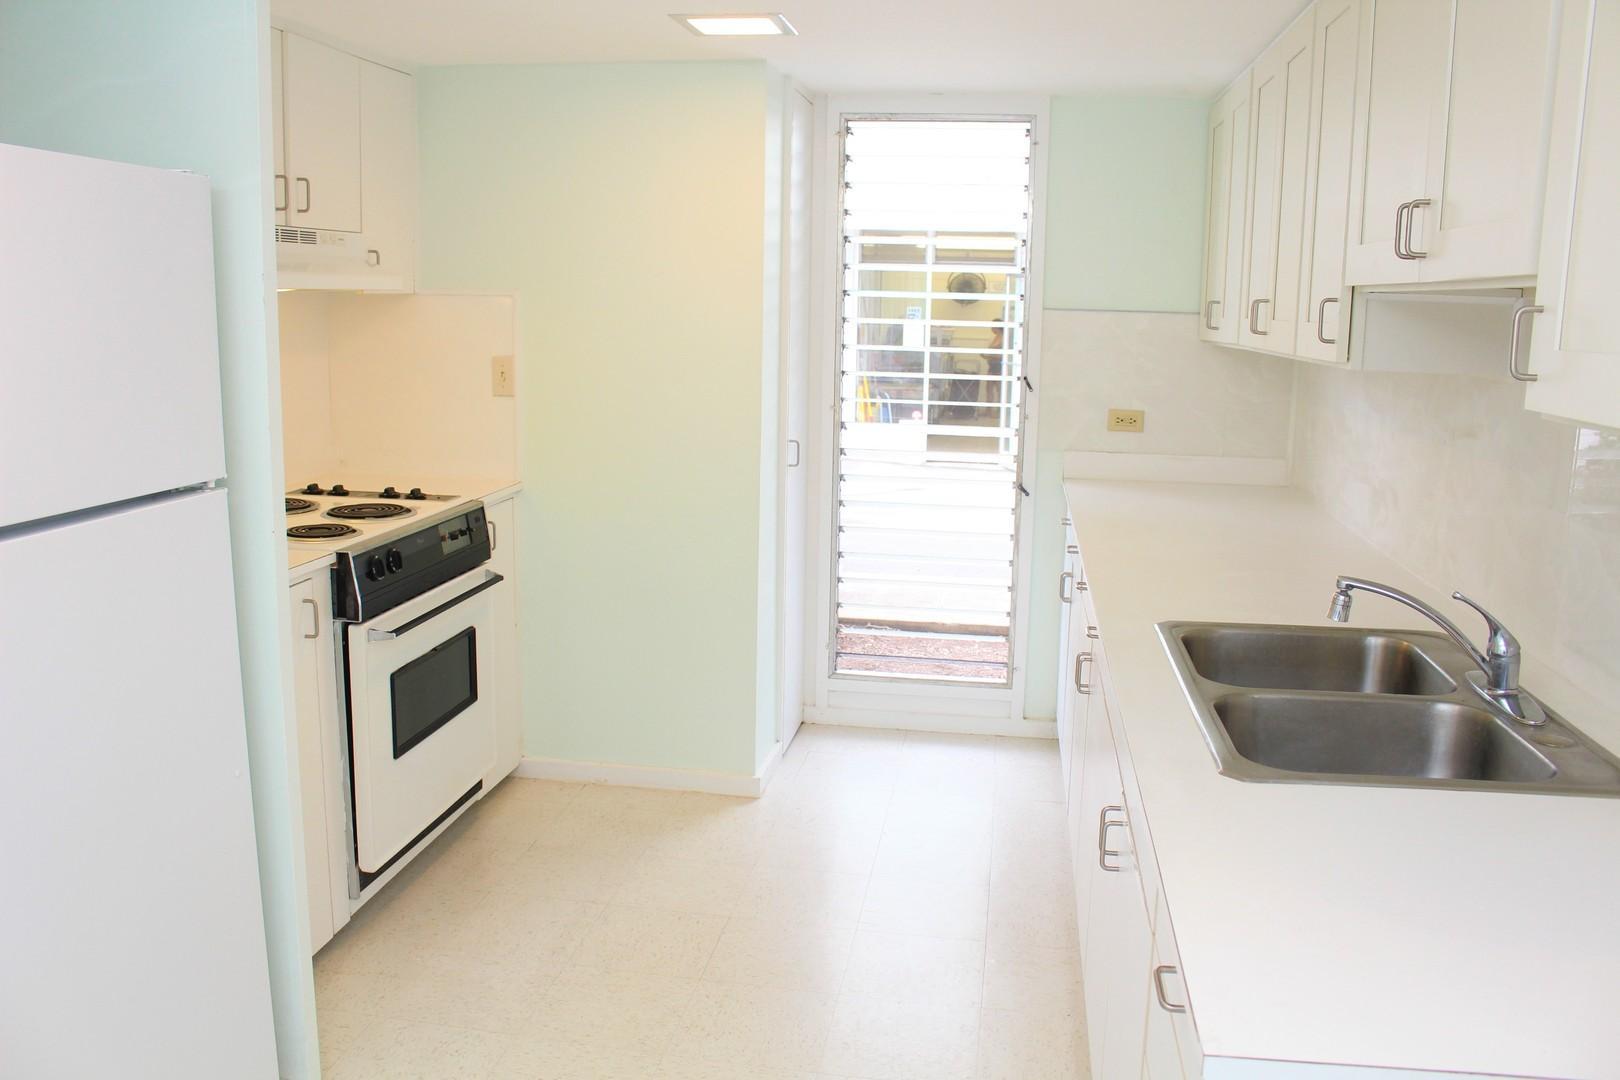 3340 Campbell Ave #101 For Rent - Honolulu, HI | Trulia